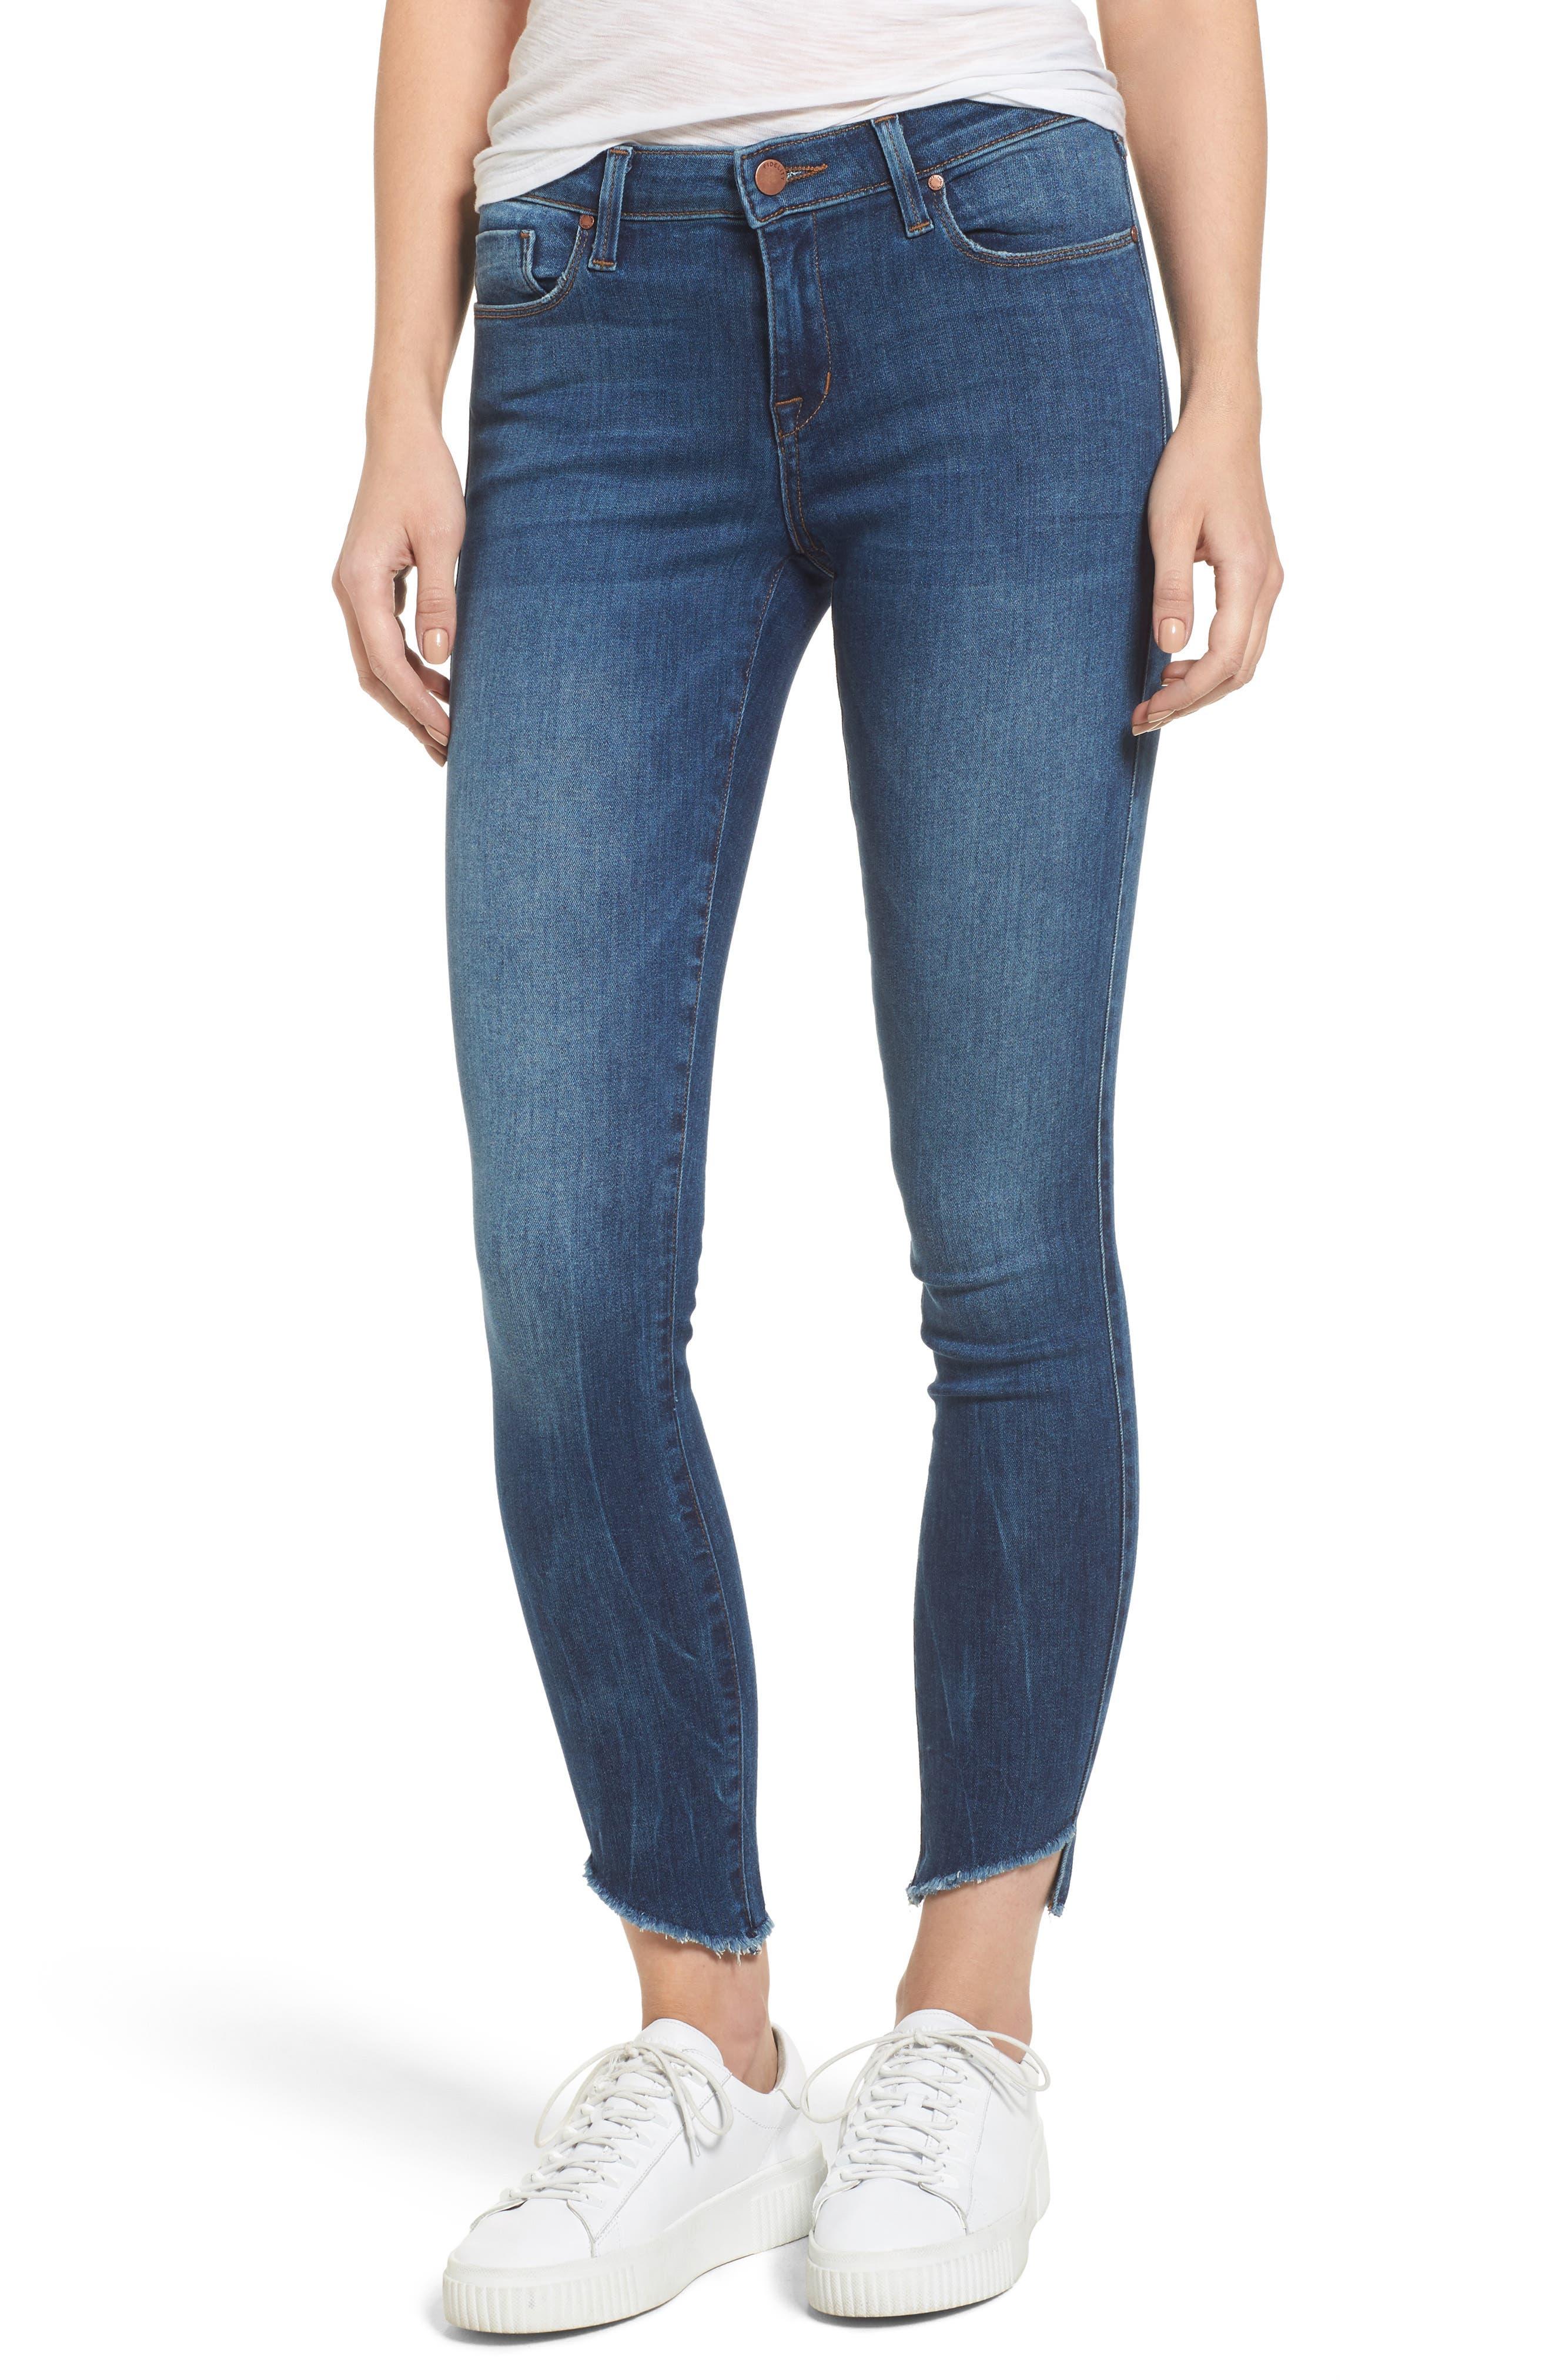 Alternate Image 1 Selected - Fidelity Denim Mila Step Hem Skinny Jeans (Vintage Blue)